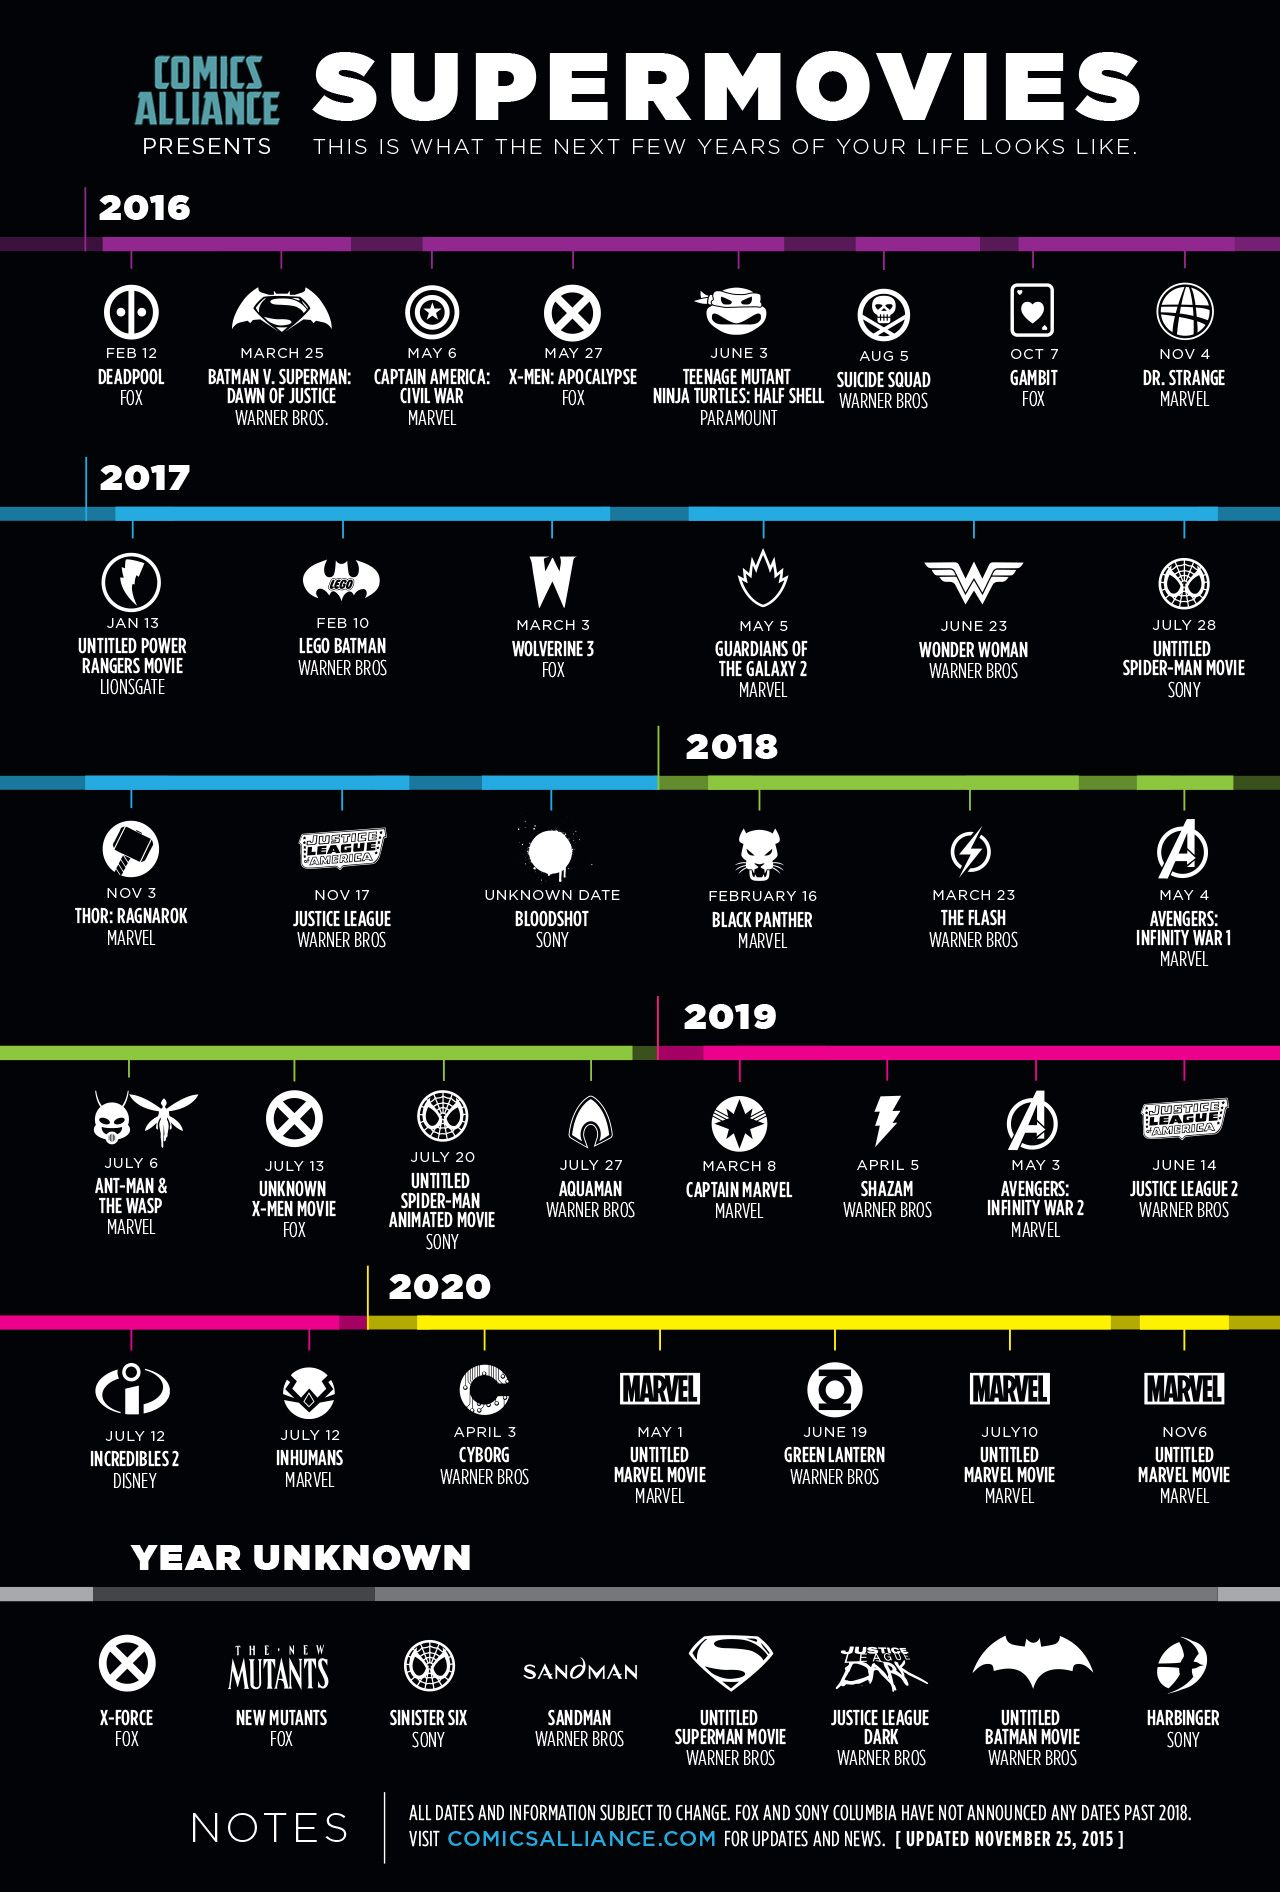 marvel comics movies coming soon